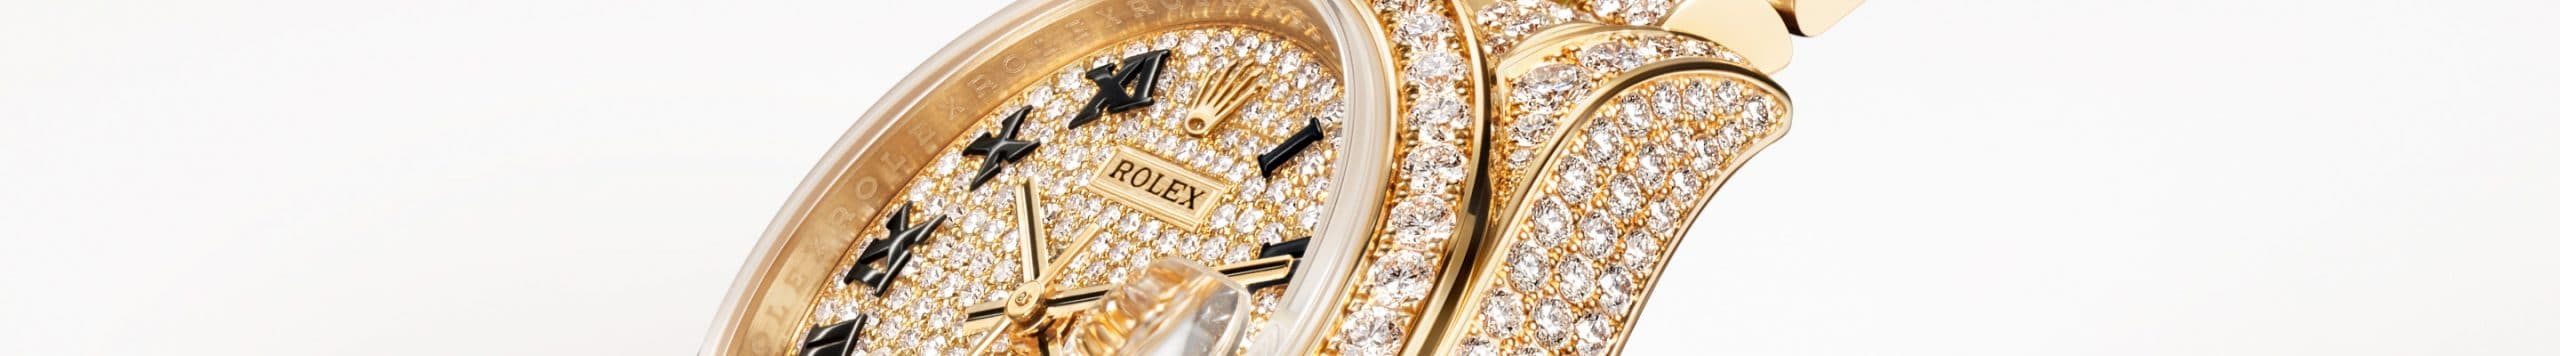 Banner นาฬิกา Rolex Lady-Datejust - Pendulum